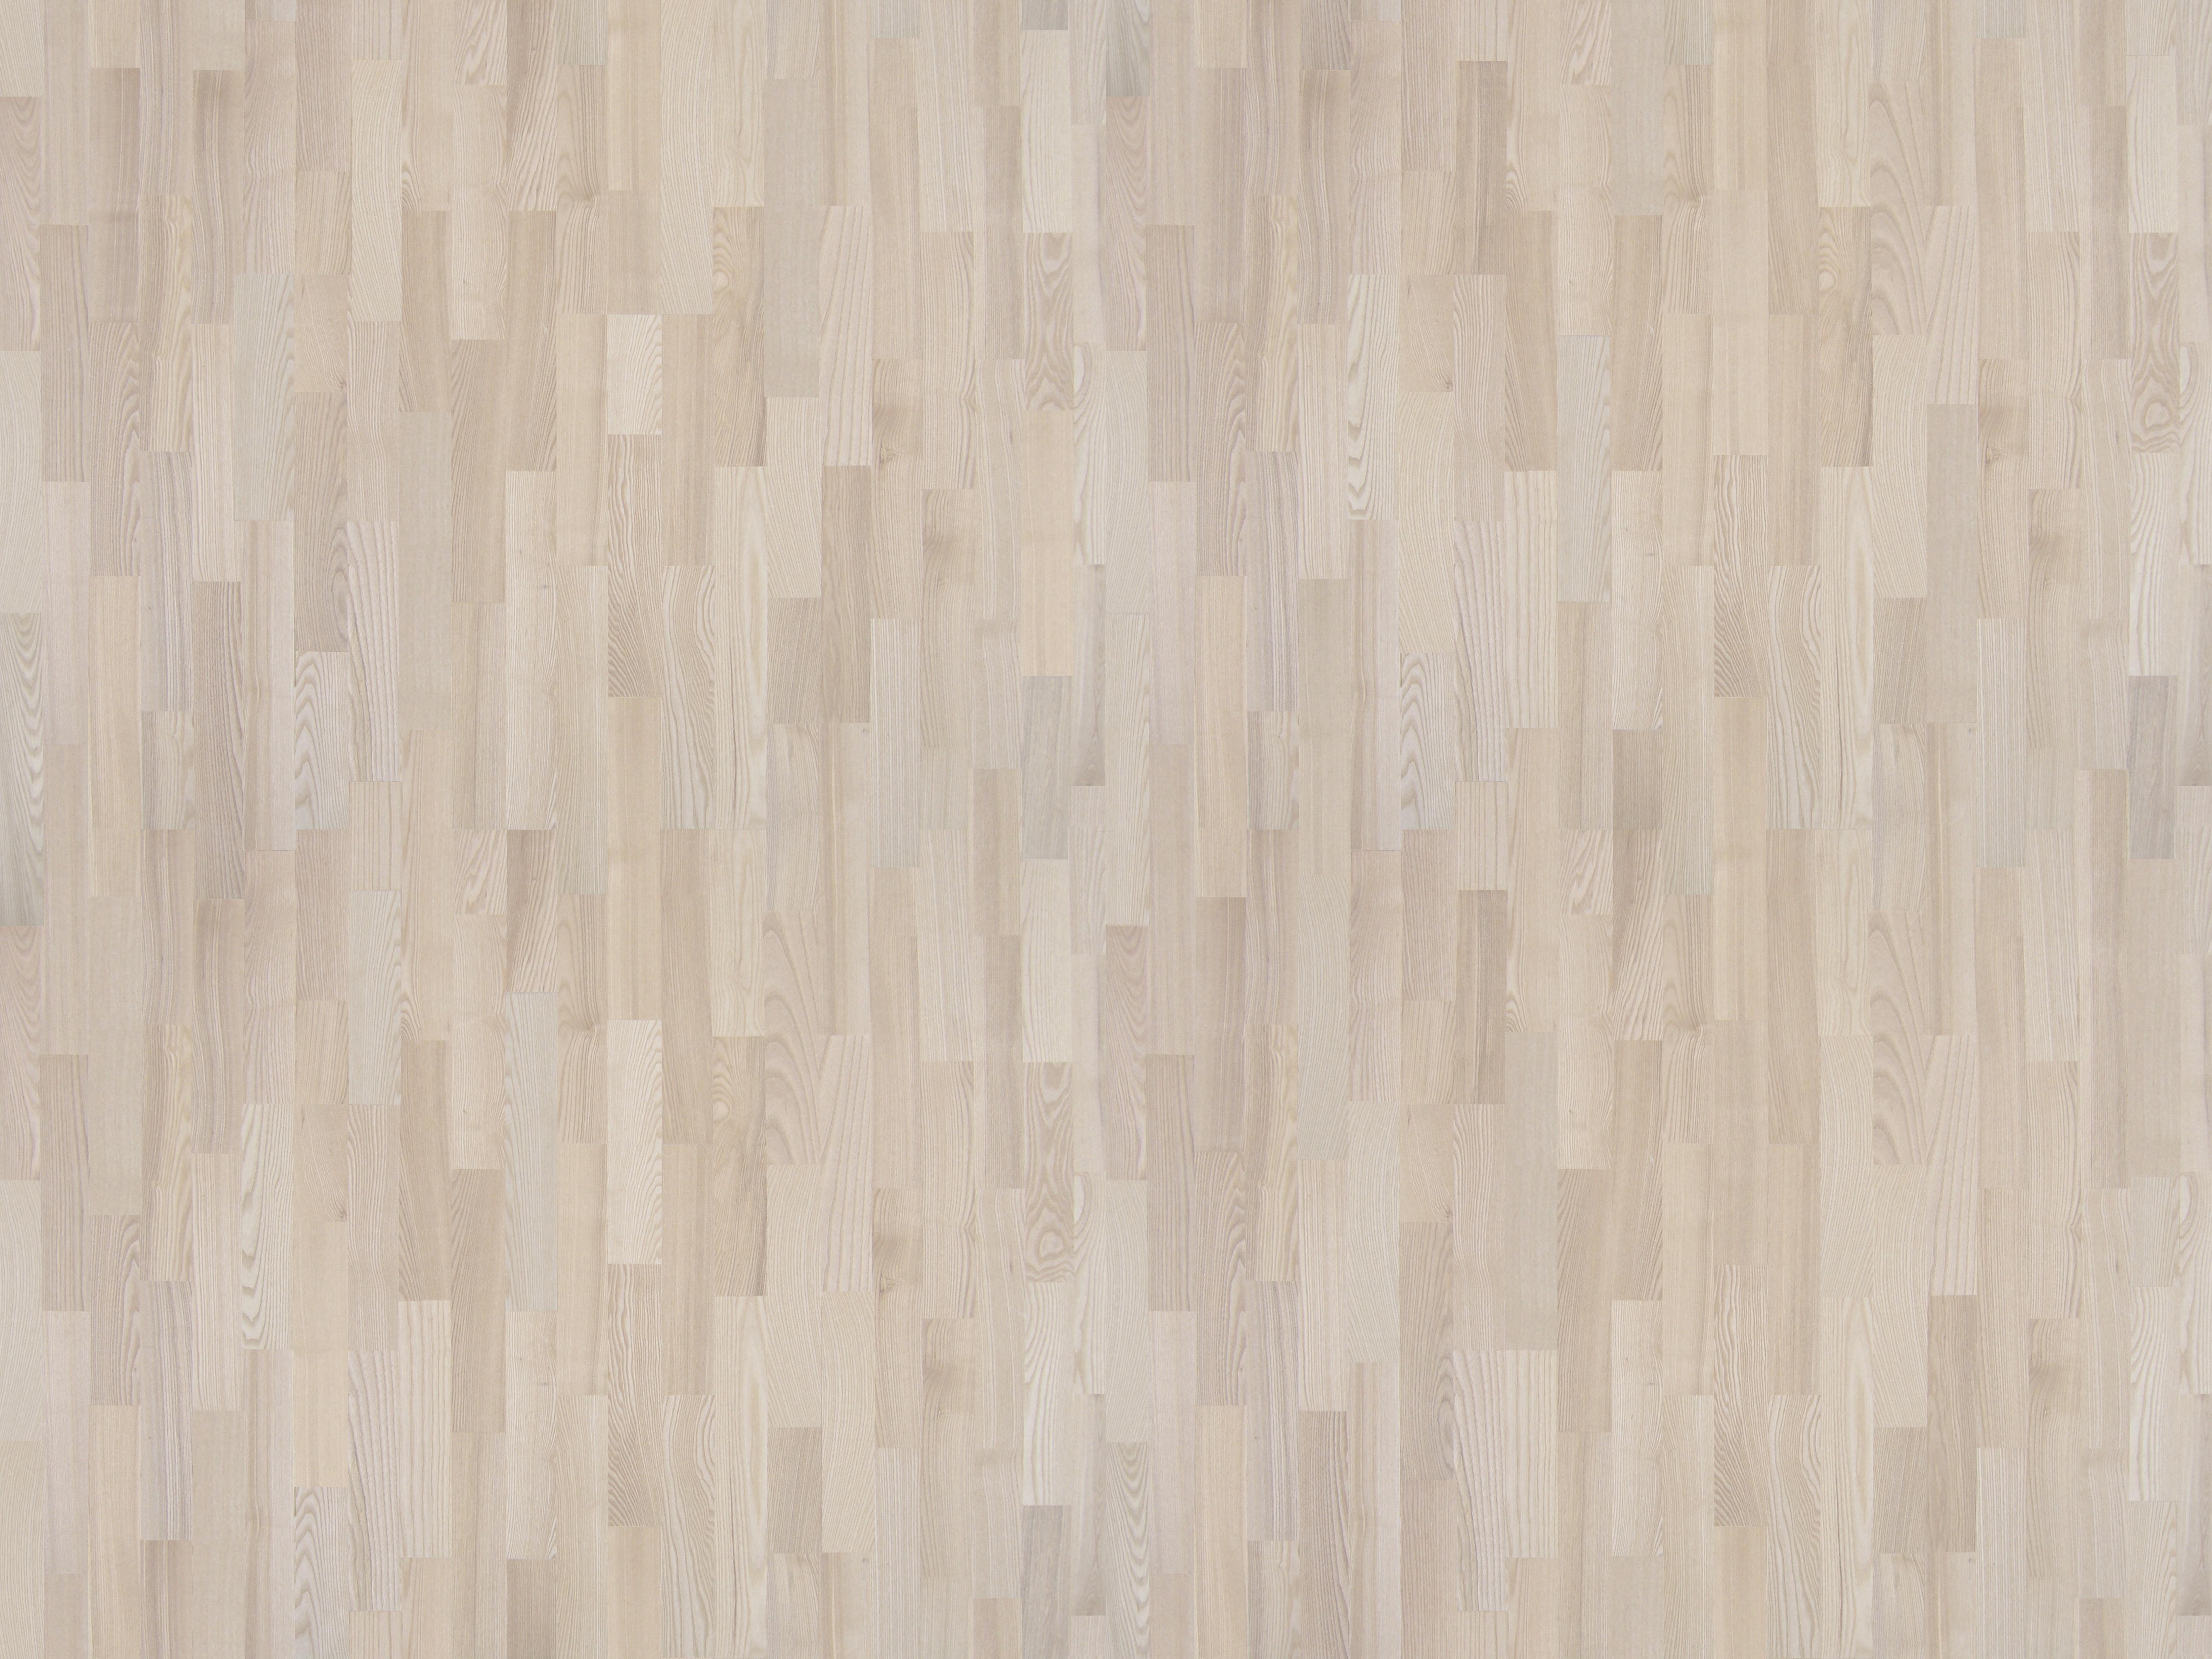 Free Seamless Texture White Ash Wood Floor Seier Seier Flickr